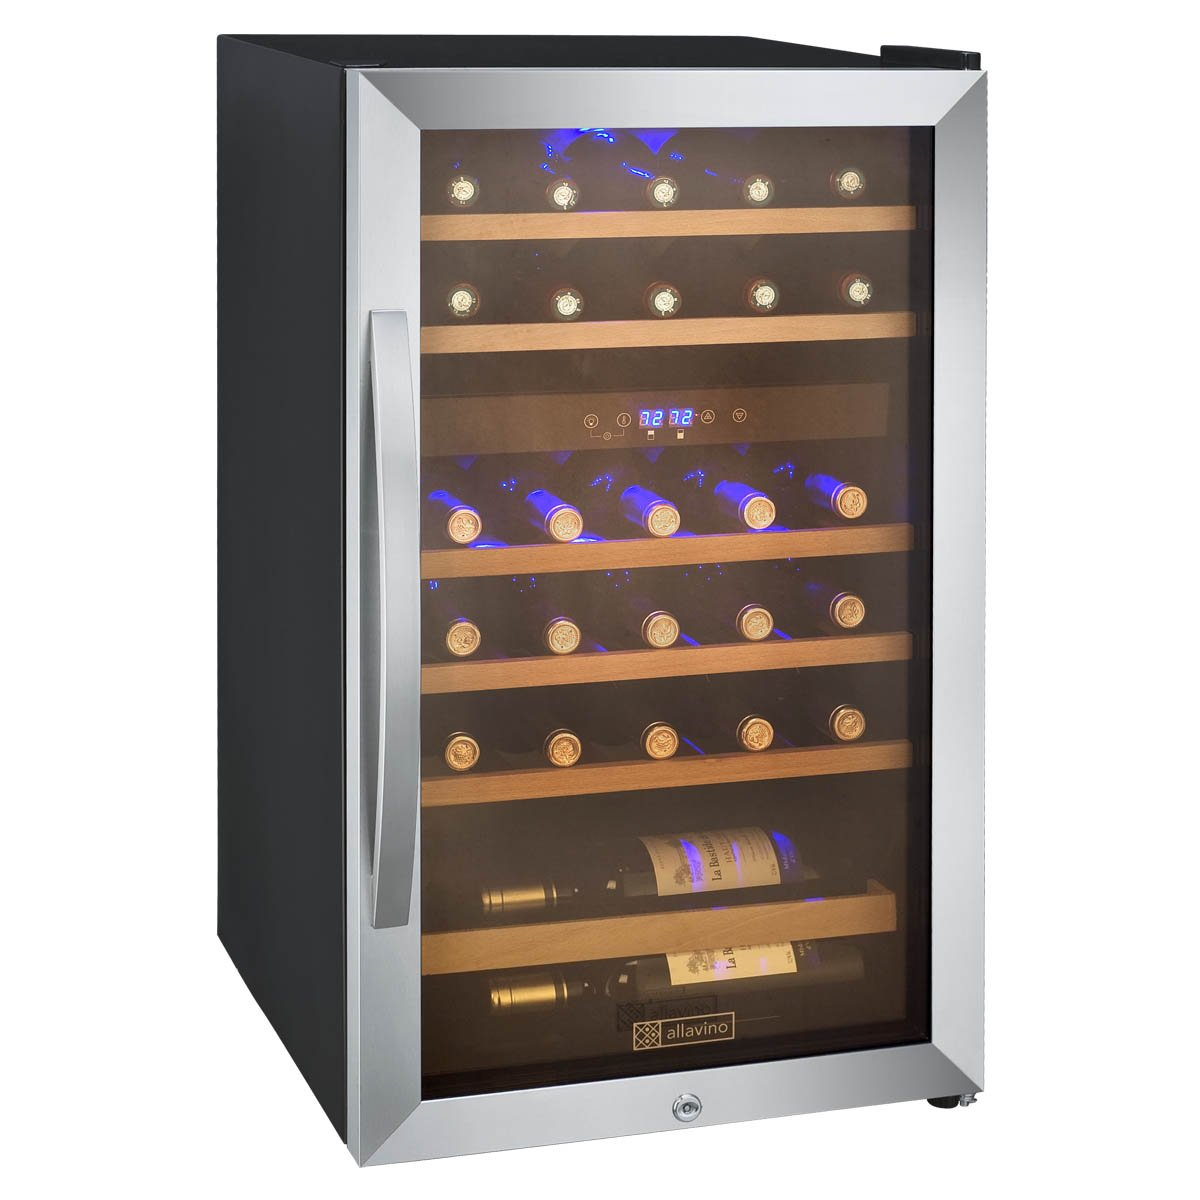 Allavino CDWR29-2SWT Cascina Series 29 Bottle Dual Zone Wine Refrigerator